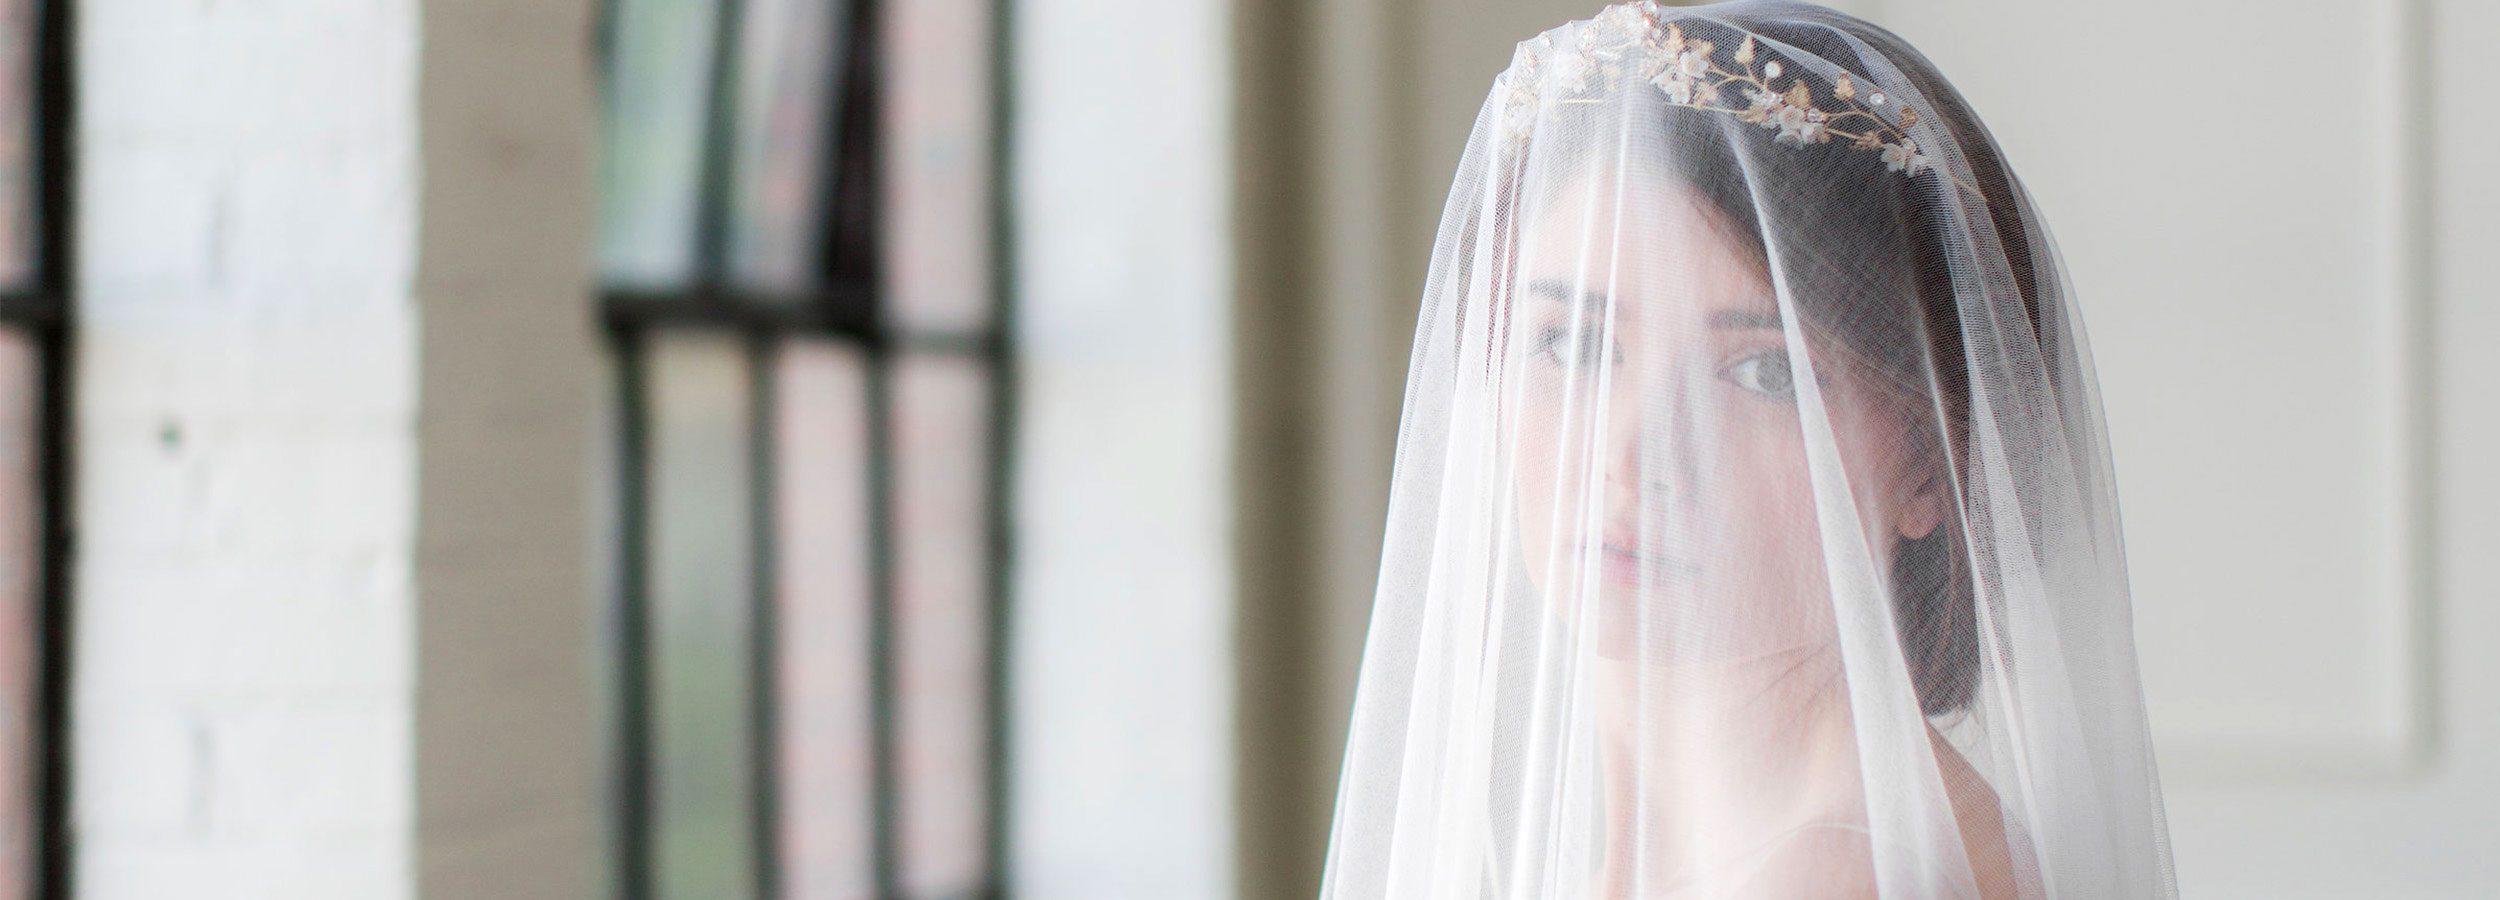 Wedding veils, bridal adornments and accessories